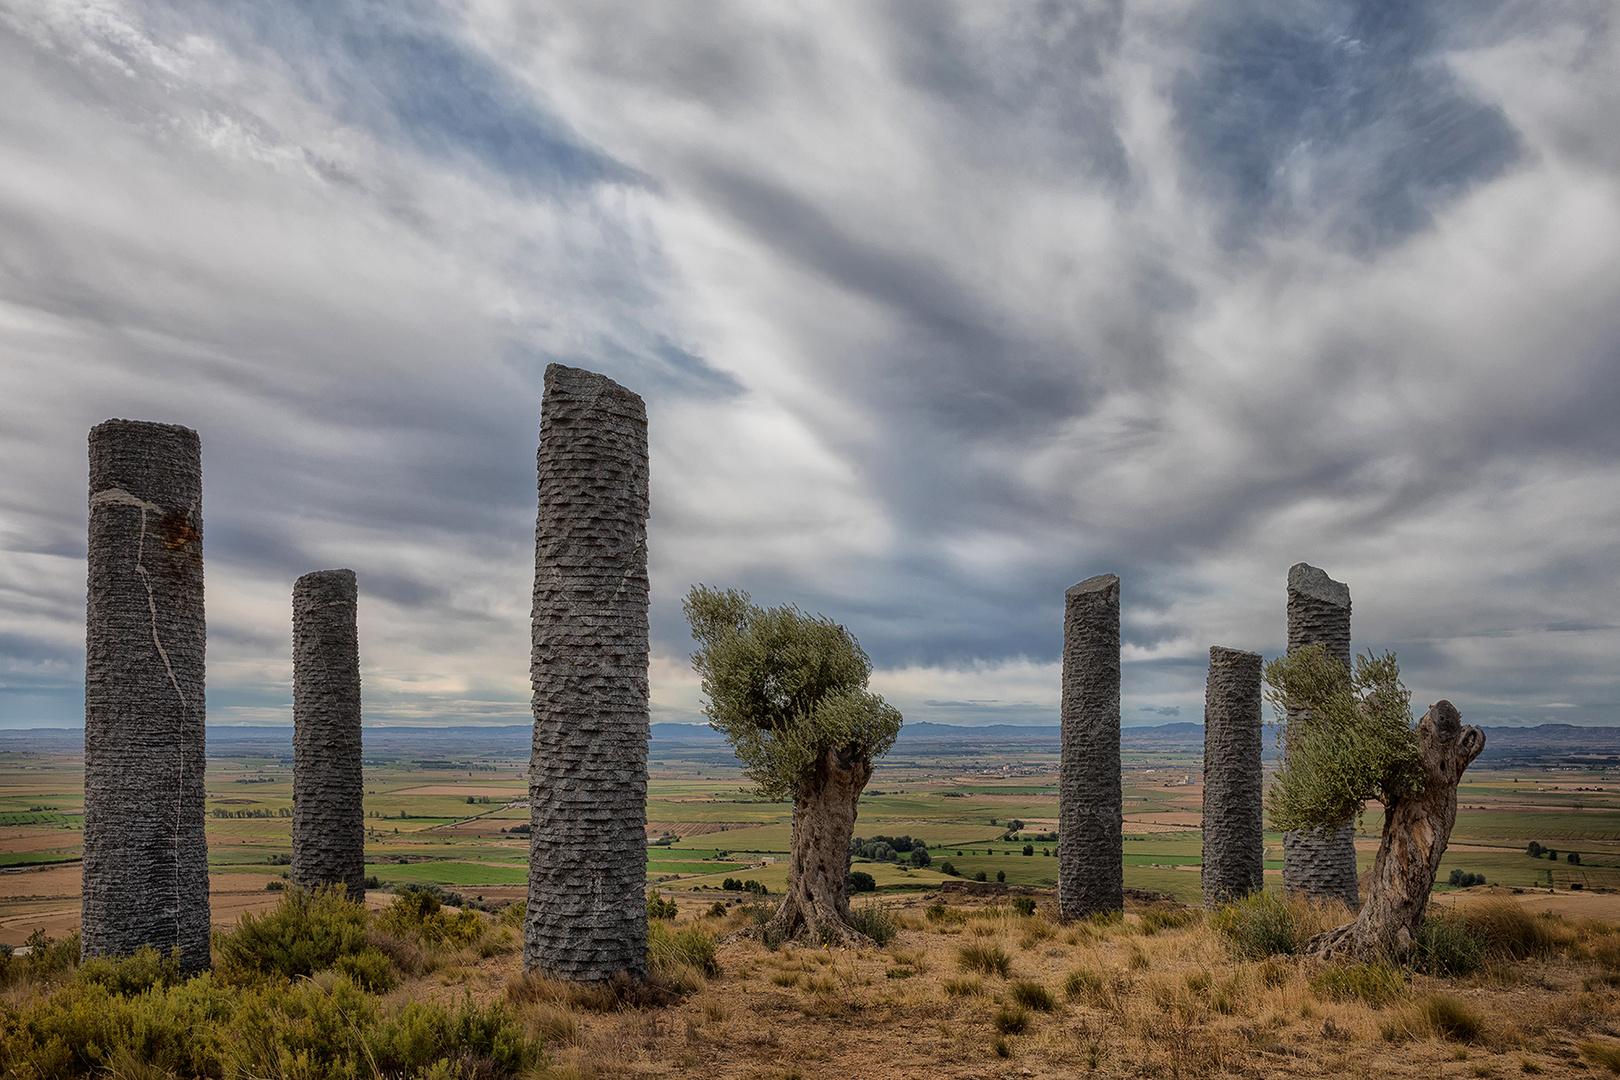 Archäologie des existierenden Lebens